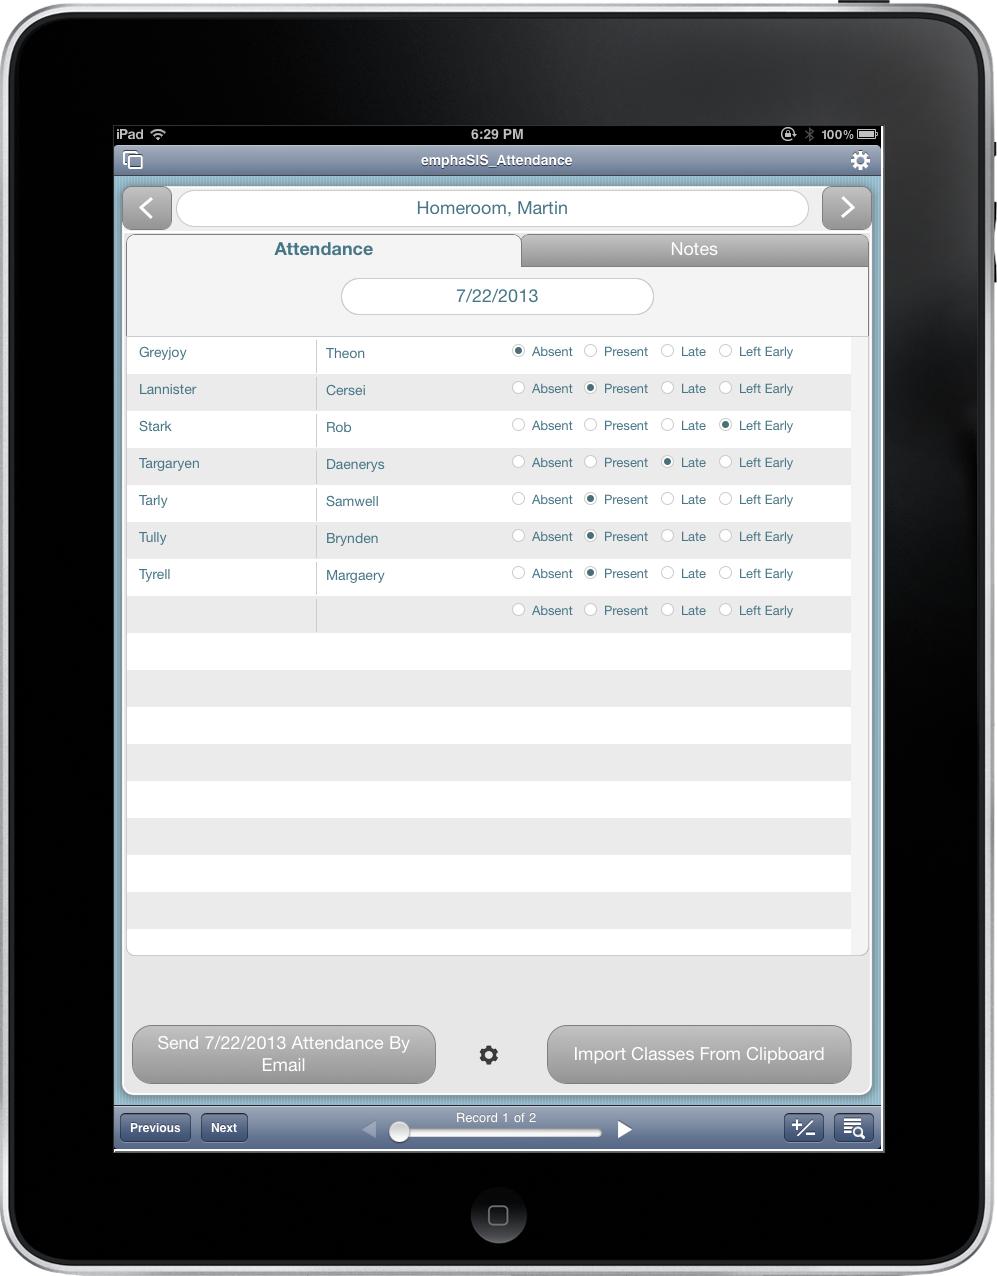 emphaSISAttendance_iPad_attendance.png